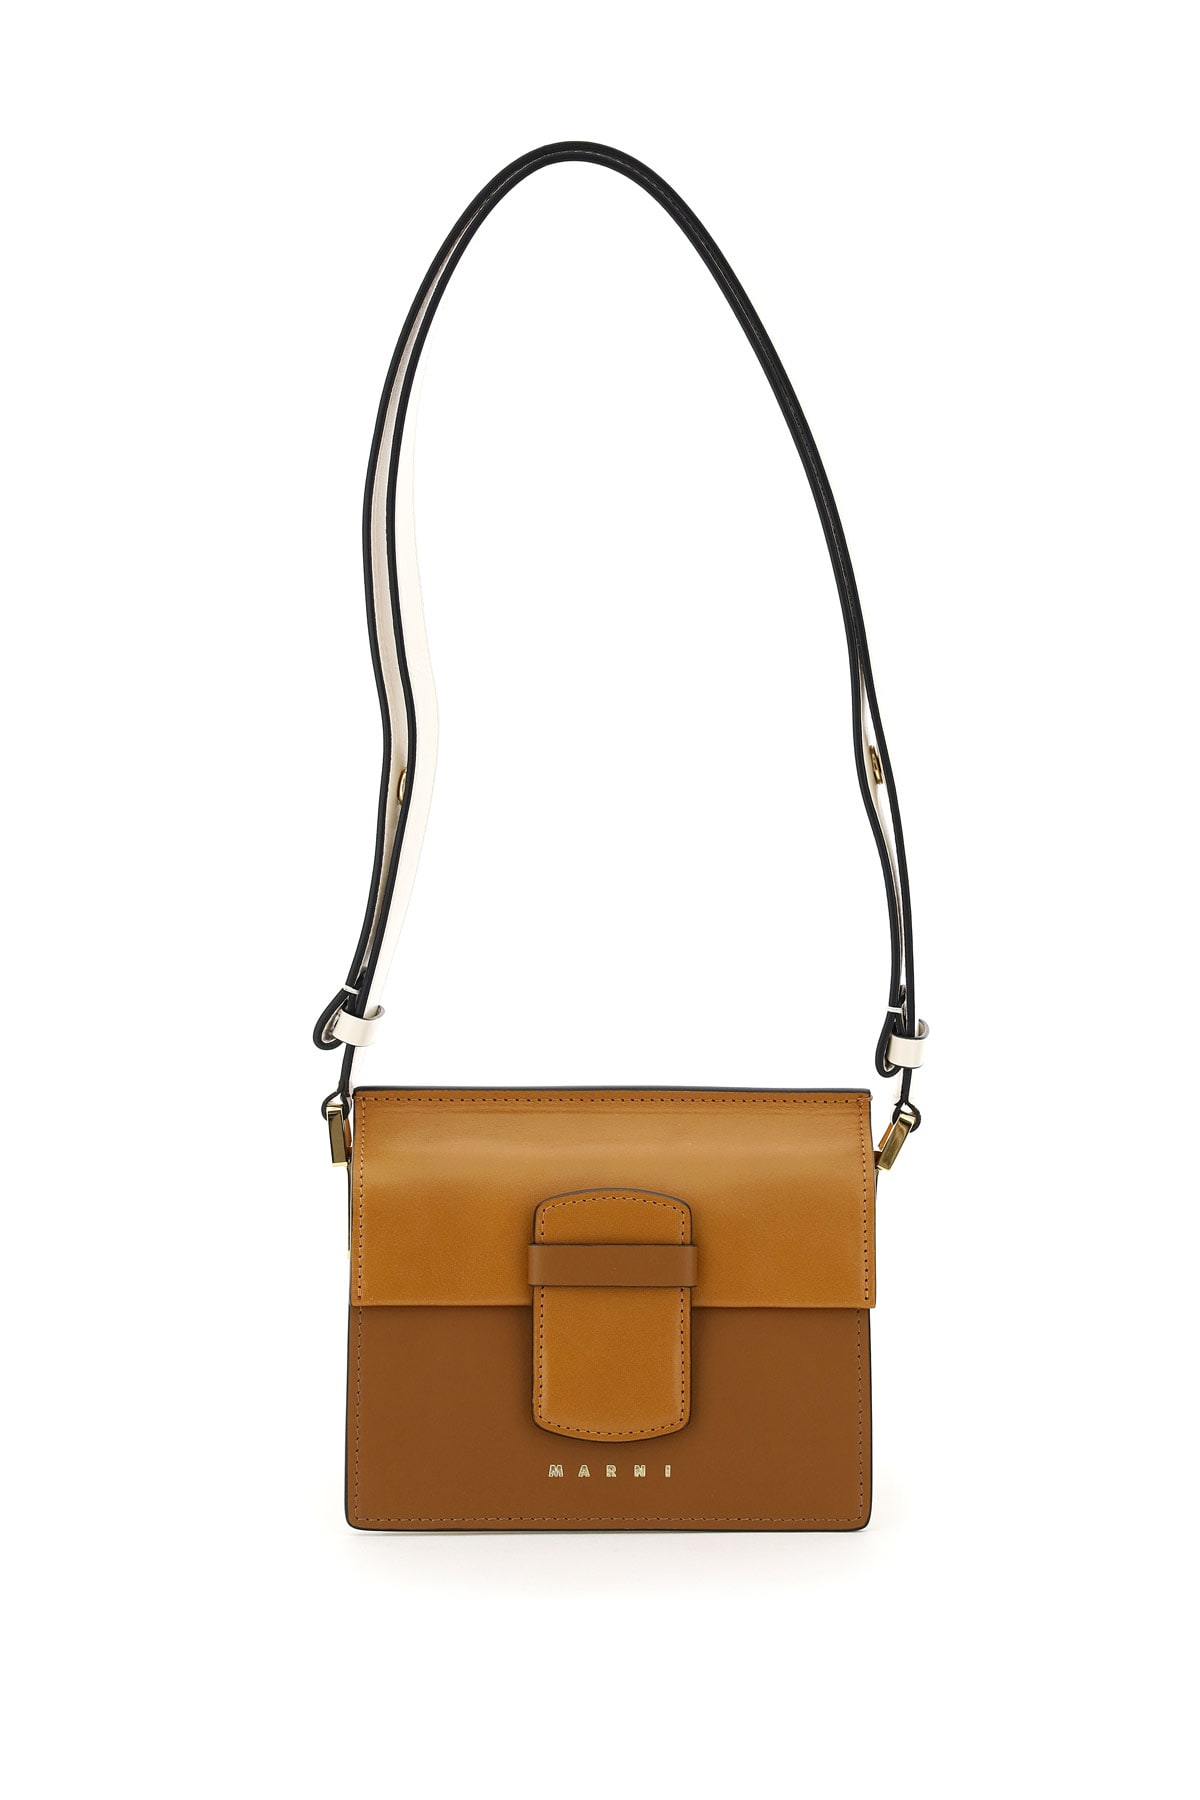 Marni Leathers SEVERINE SMALL SHOULDER BAG